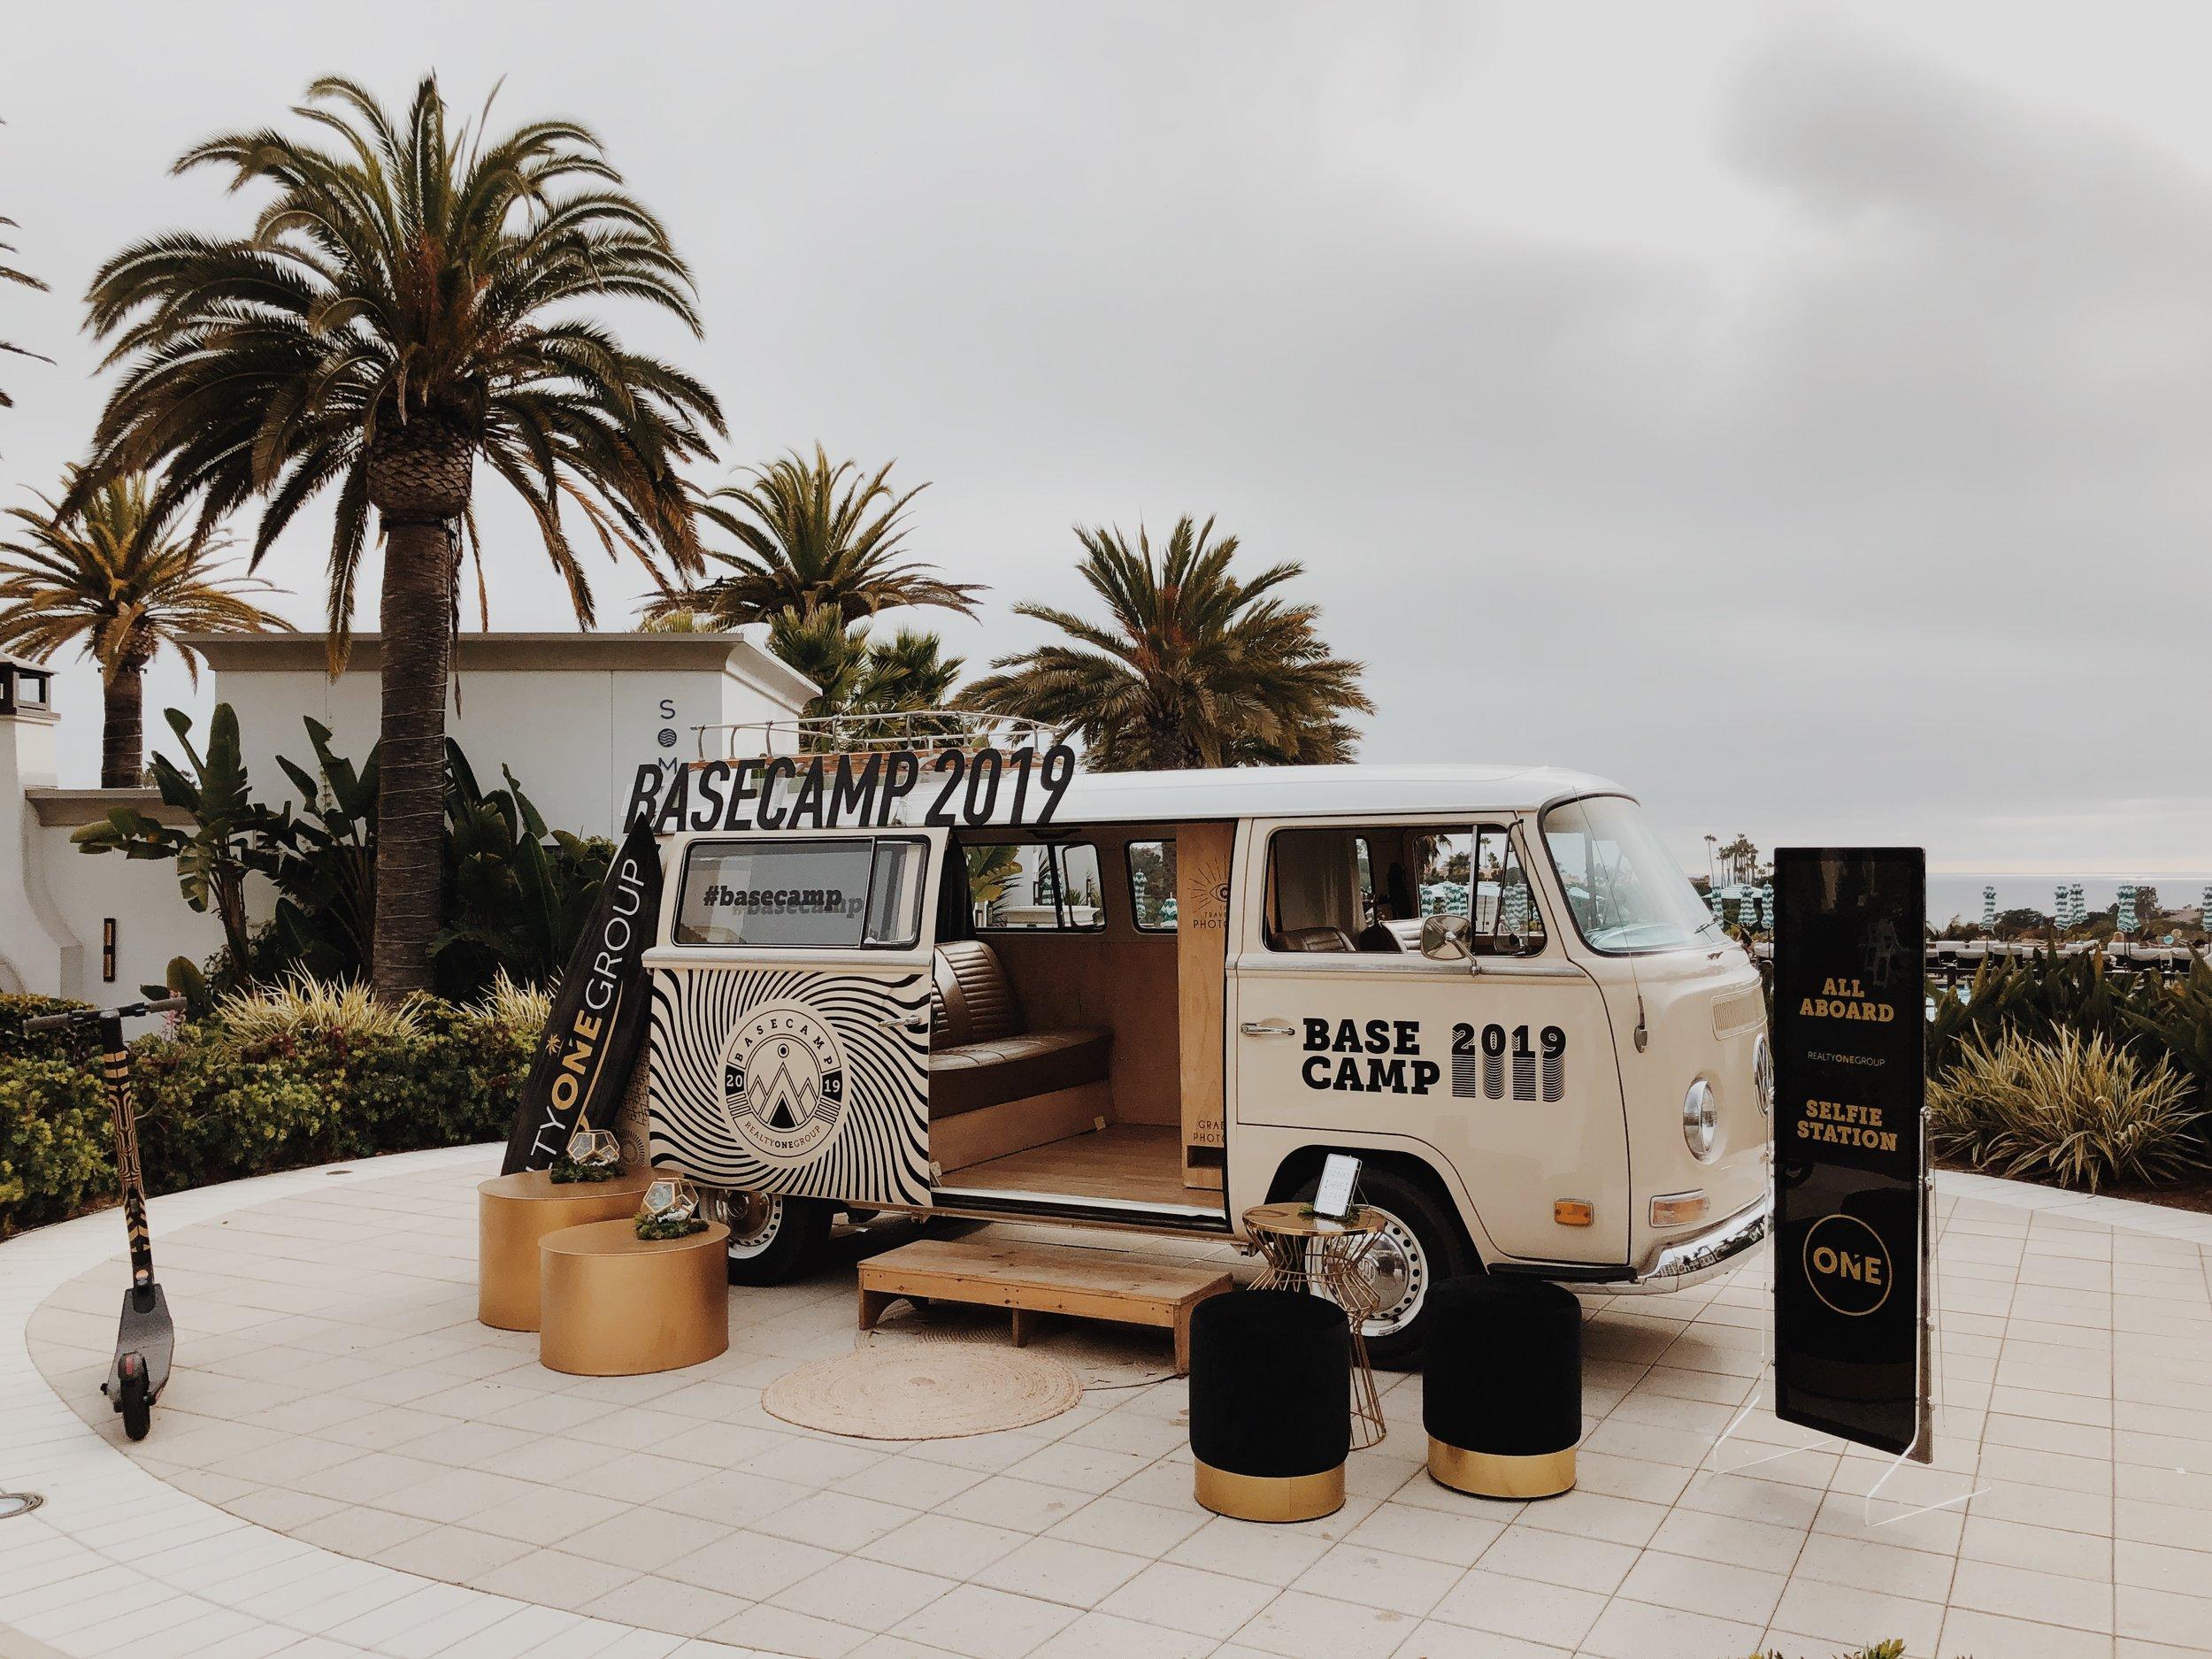 Santa barbara corporate event photo booth bus .JPG.JPG